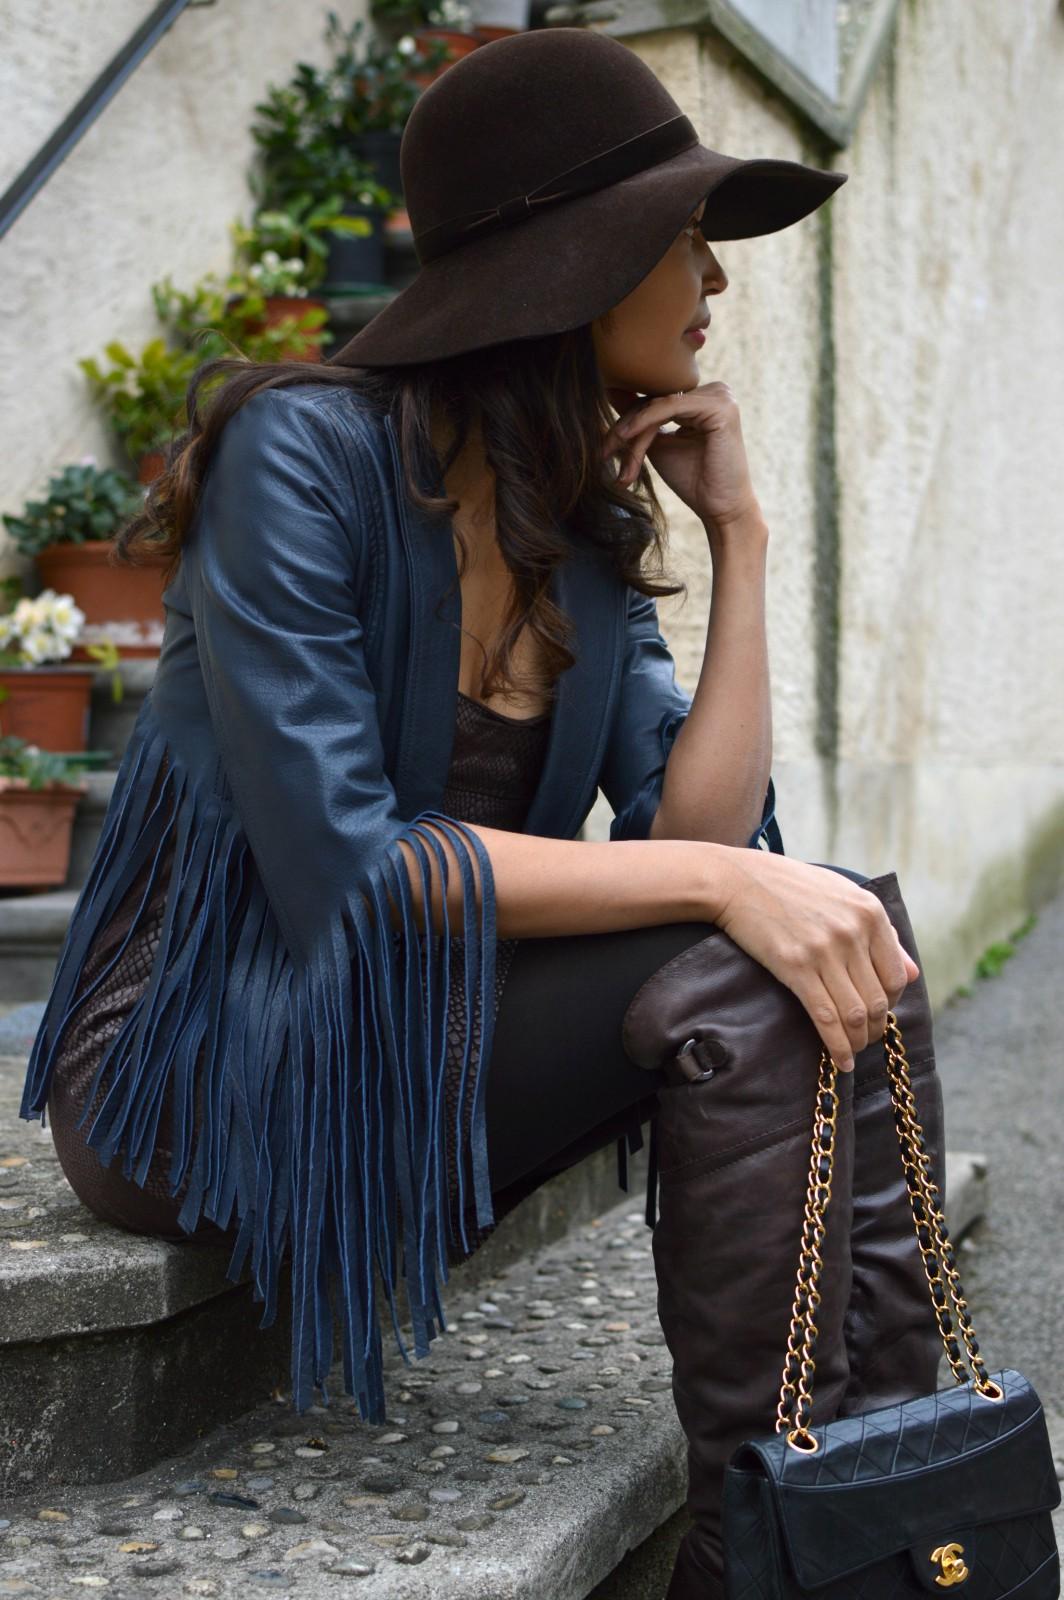 By Vanja Jocic_floppy felt hat_currently wearing fashion blog